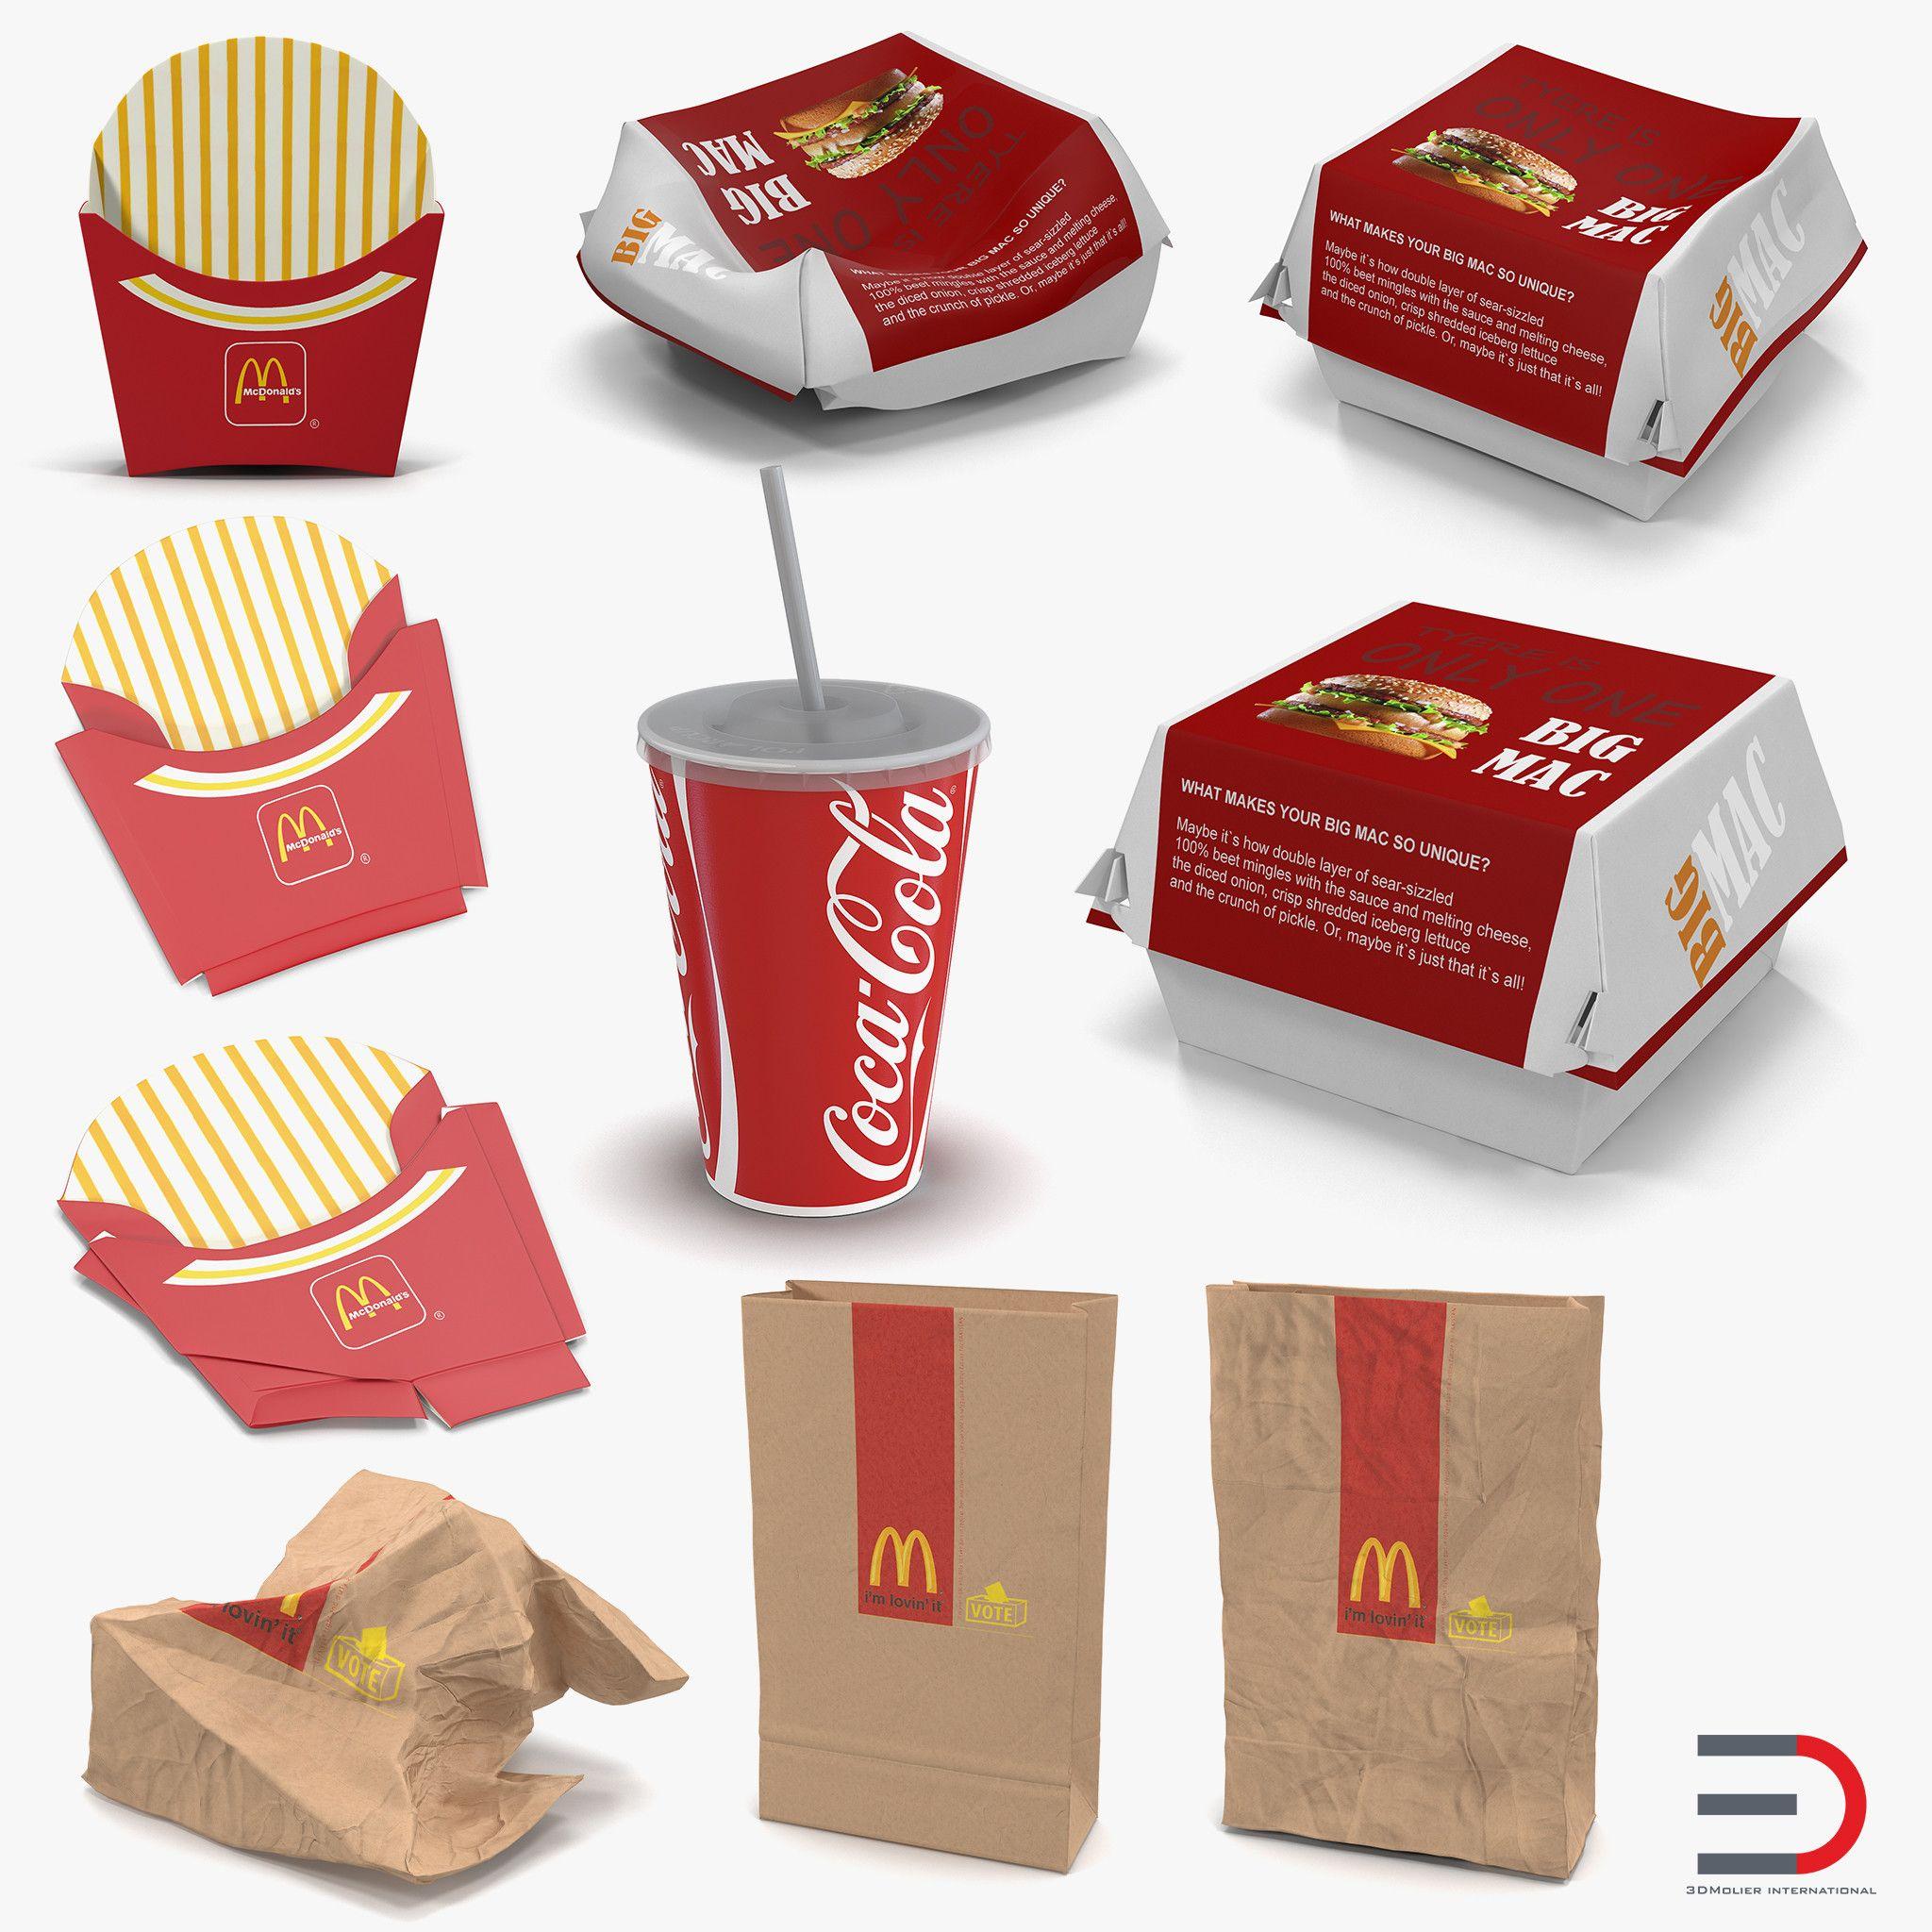 3d Mcdonalds Packaging Collection 2 Model Mcdonalds 3d Model Burger Box